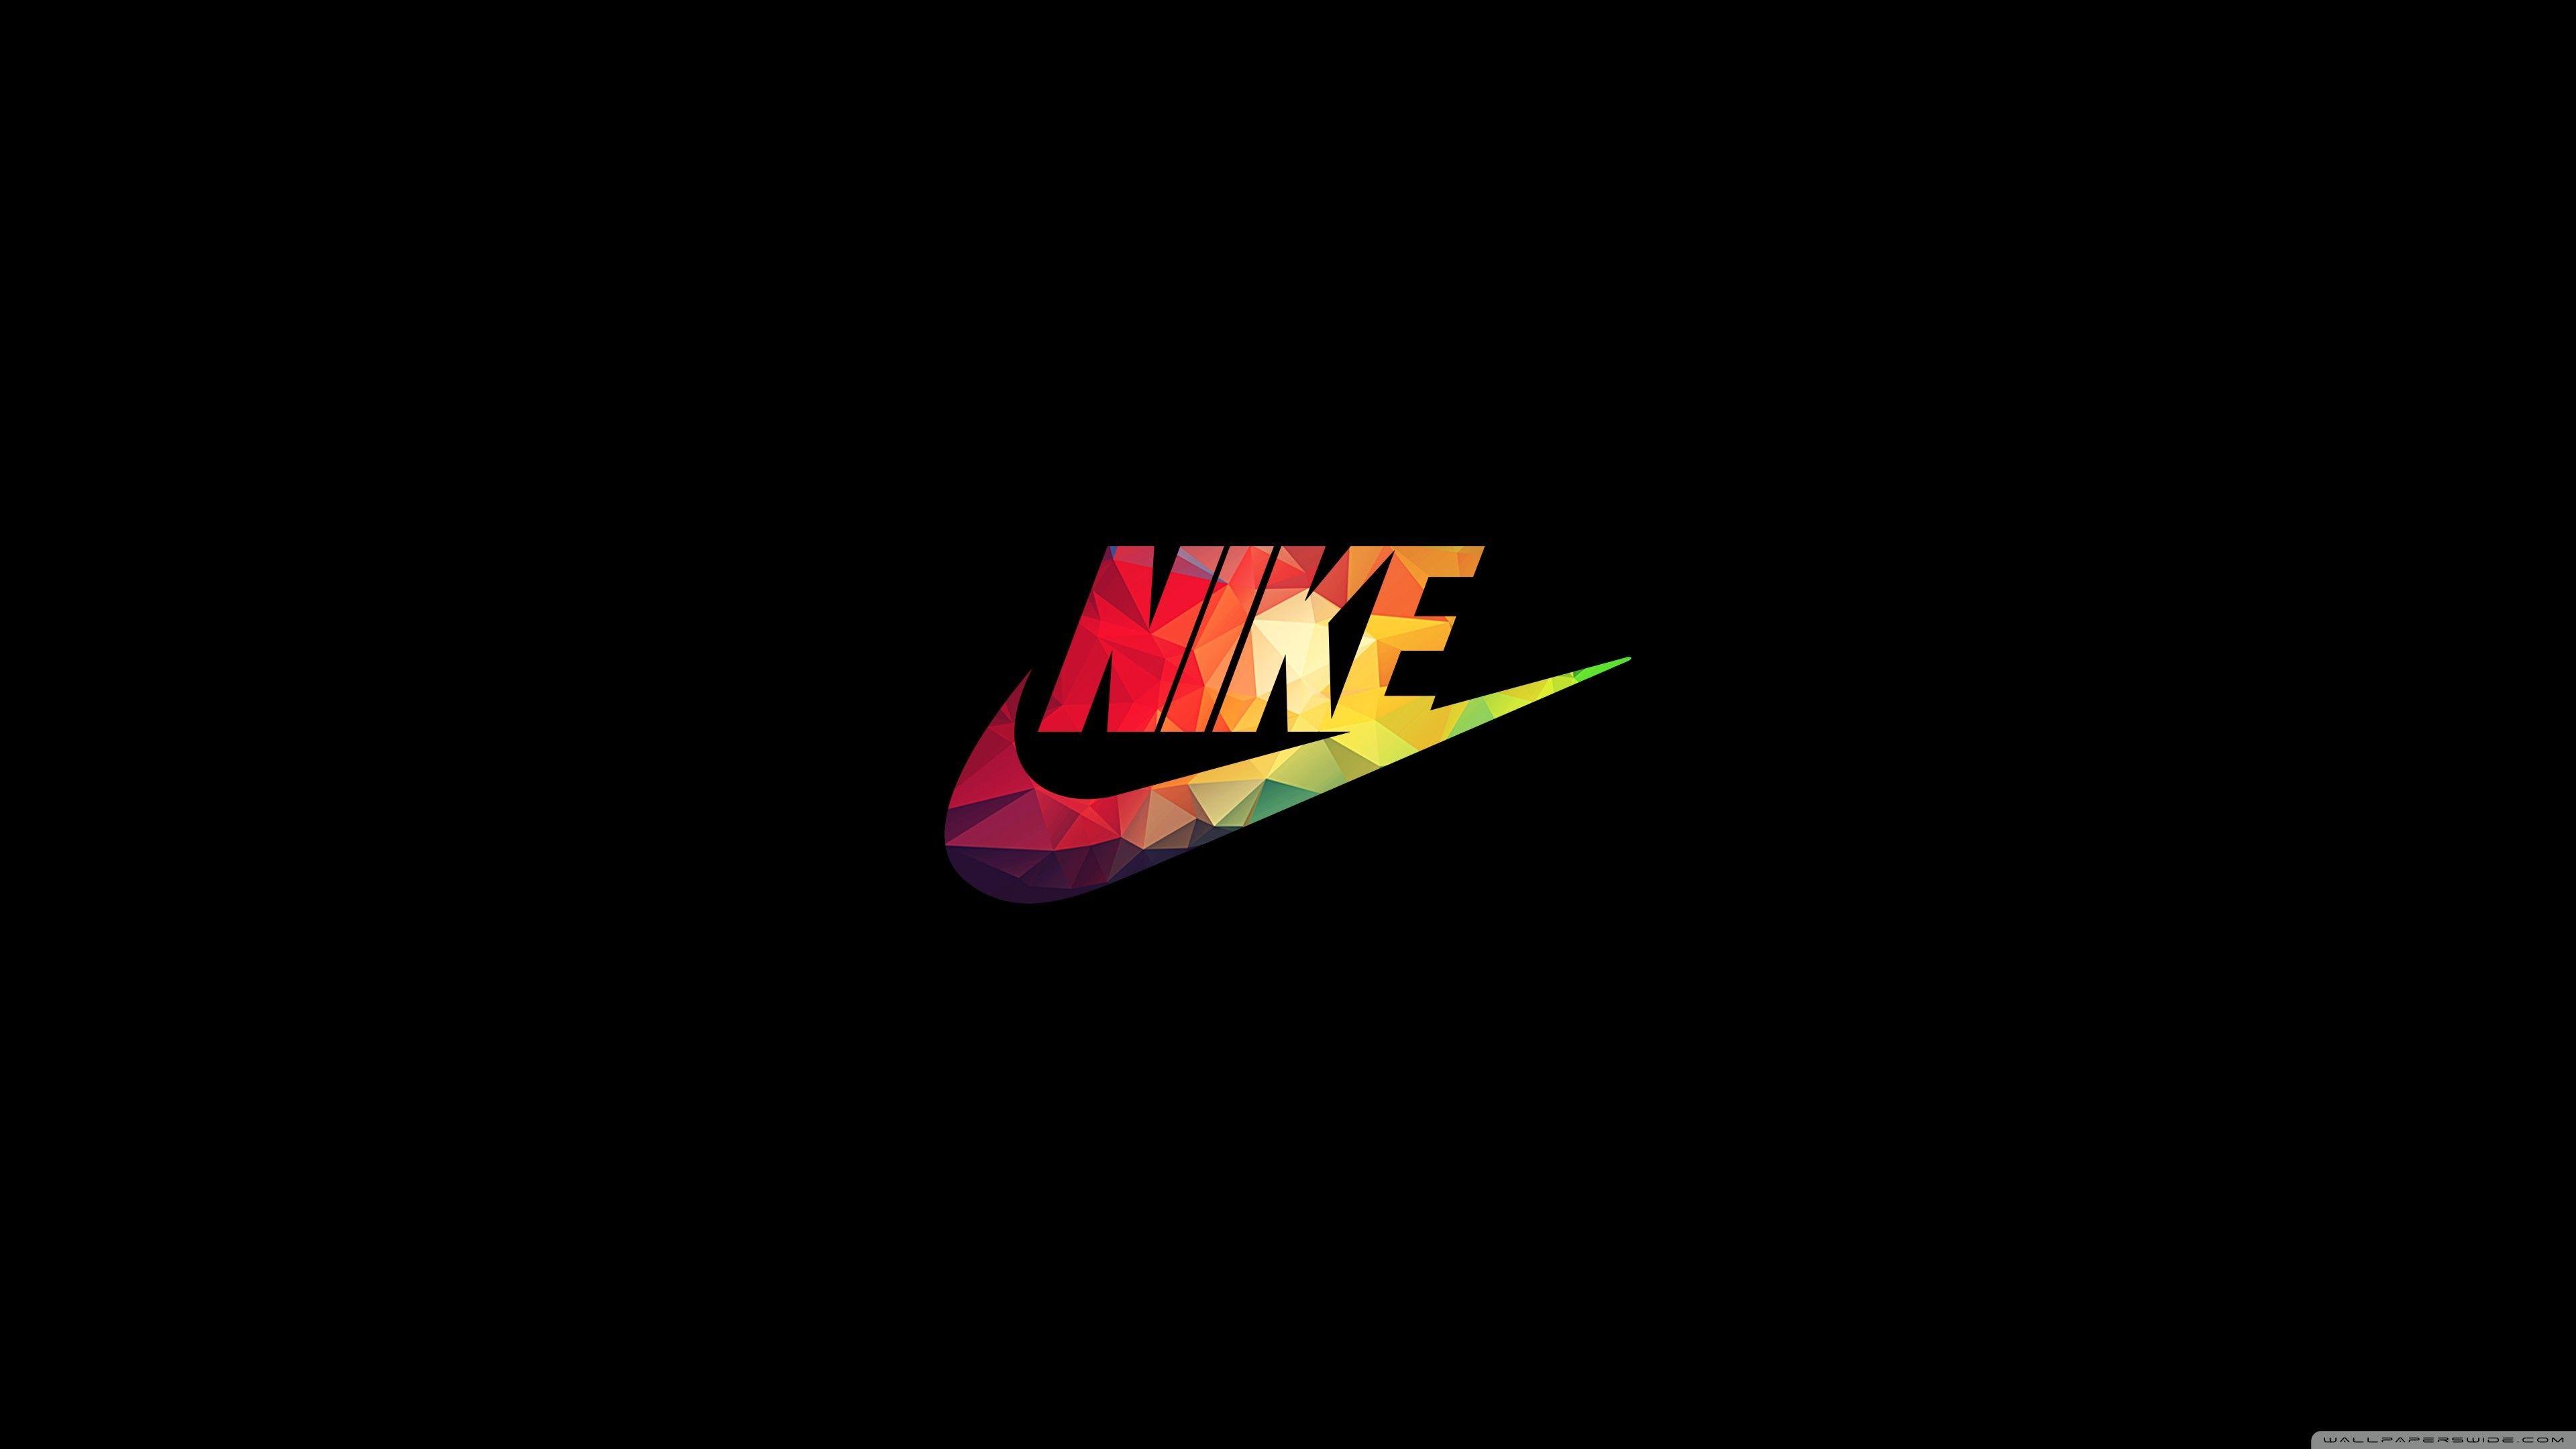 Nike 4K Wallpapers   Top Nike 4K Backgrounds   WallpaperAccess 3840x2160